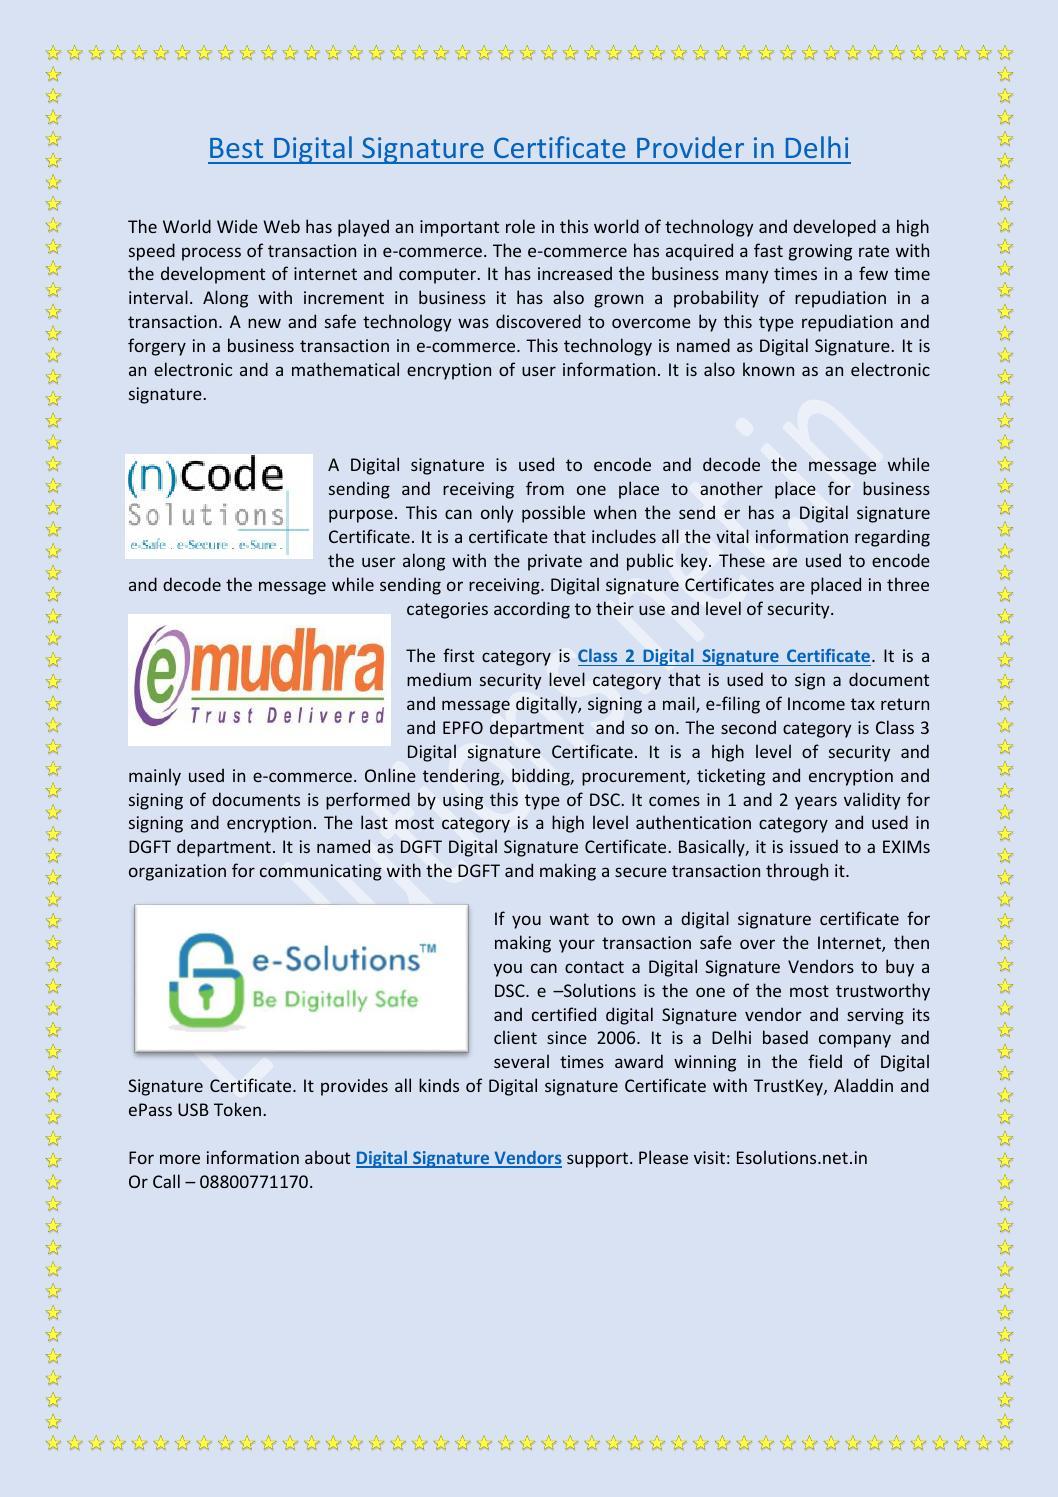 Best Digital Signature Certificate Provider In Delhi By